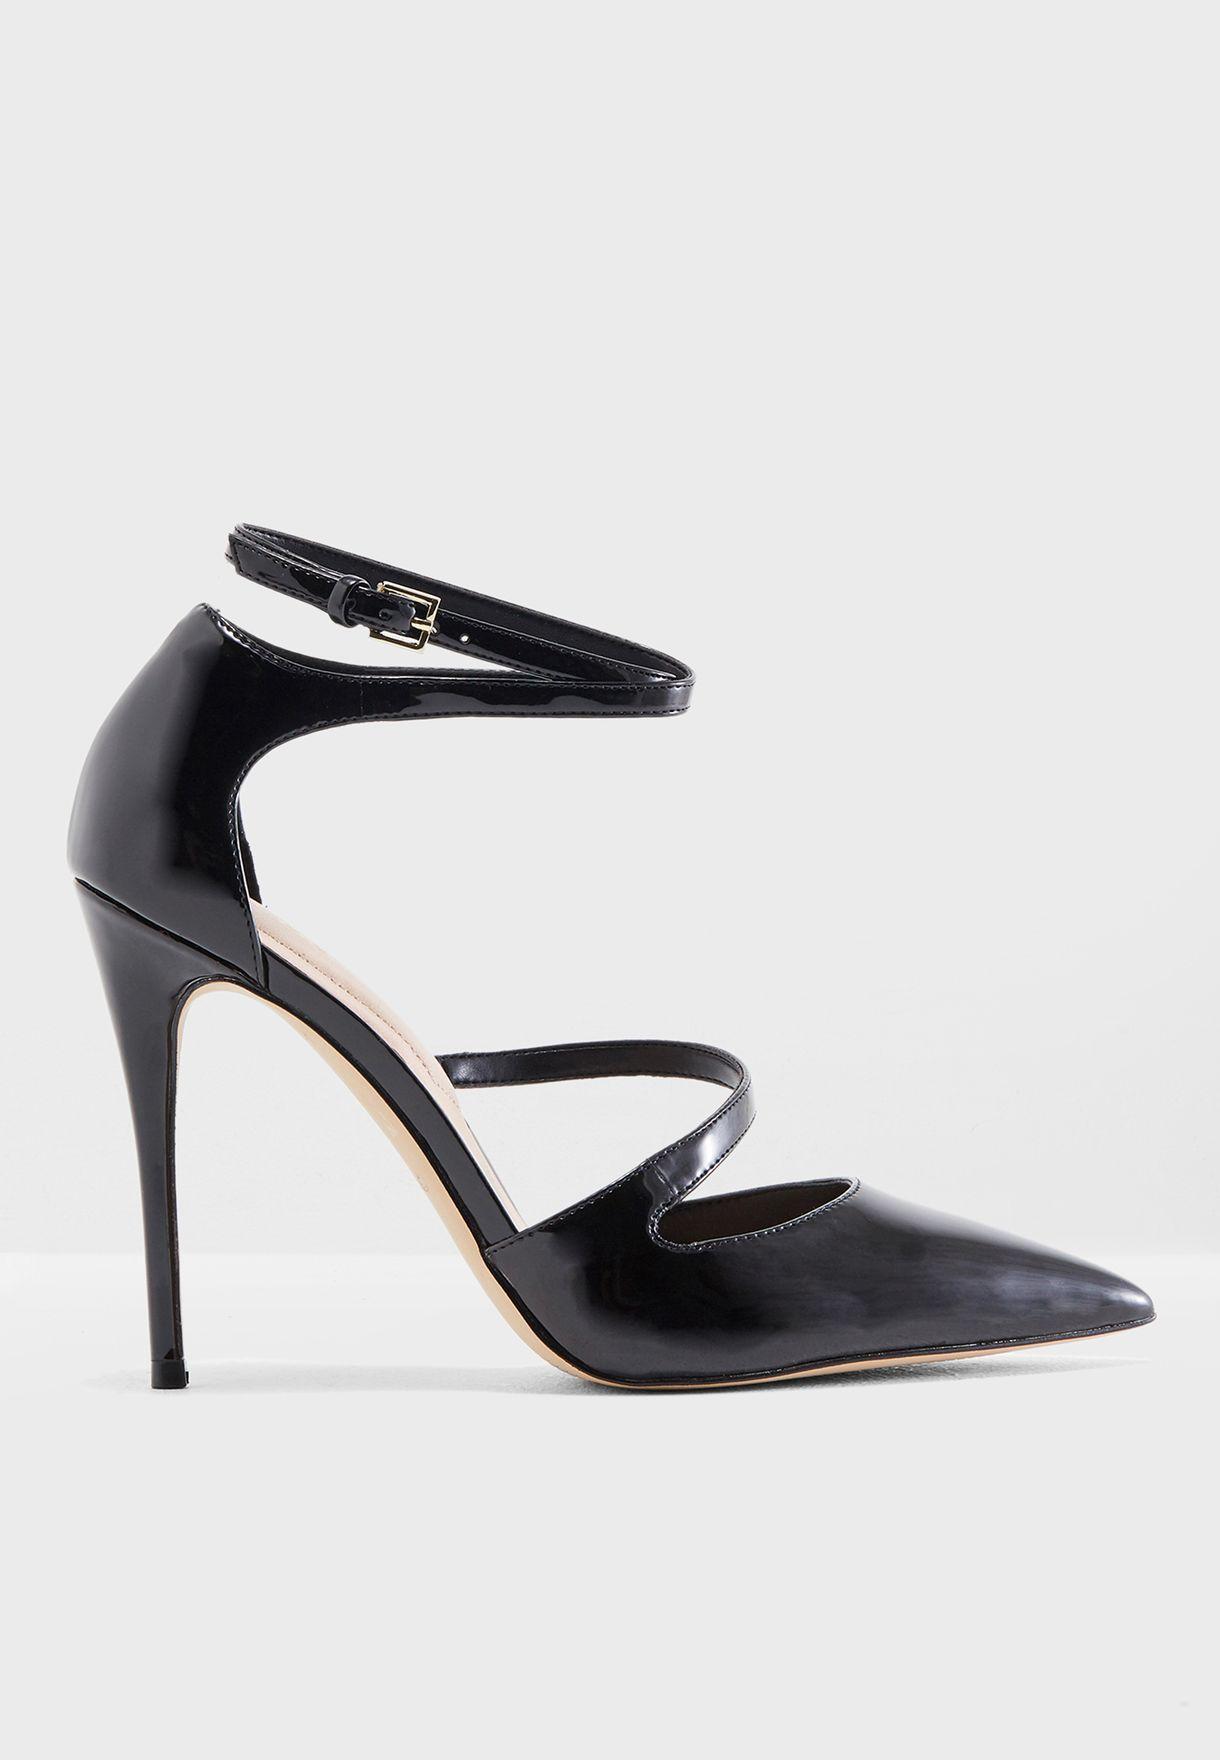 35ce1f002a35 Shop Aldo black Sevoivia Strappy High Heel Pump SEVOIVIA95 for Women ...